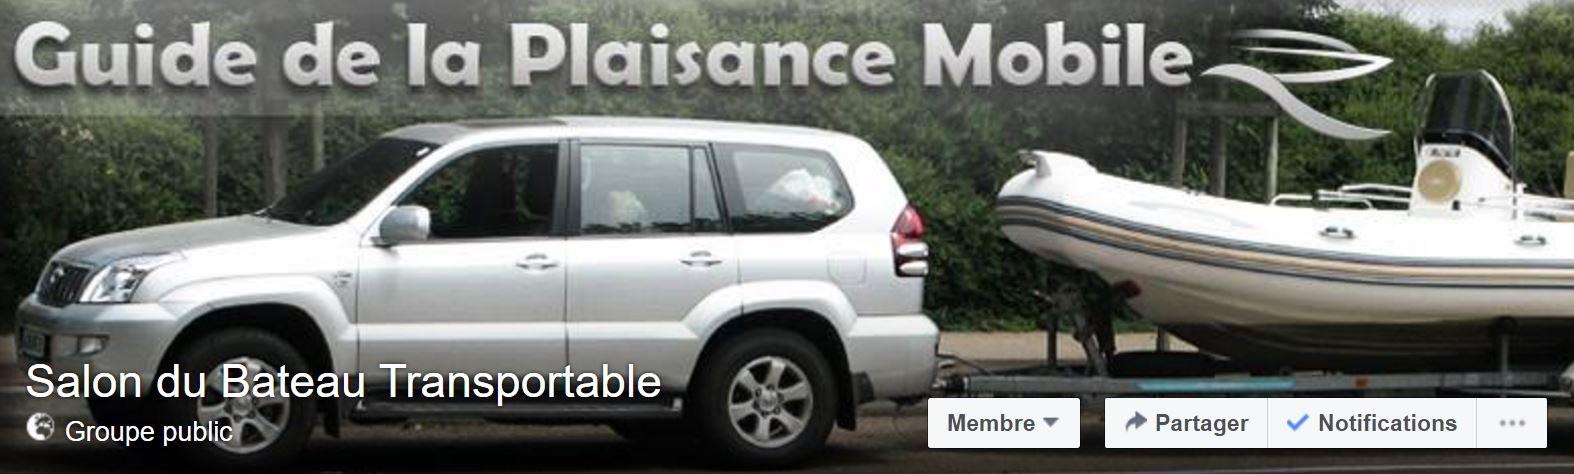 http://static.blog4ever.com/2012/03/678268/salon-du-bateau-transportable.JPG